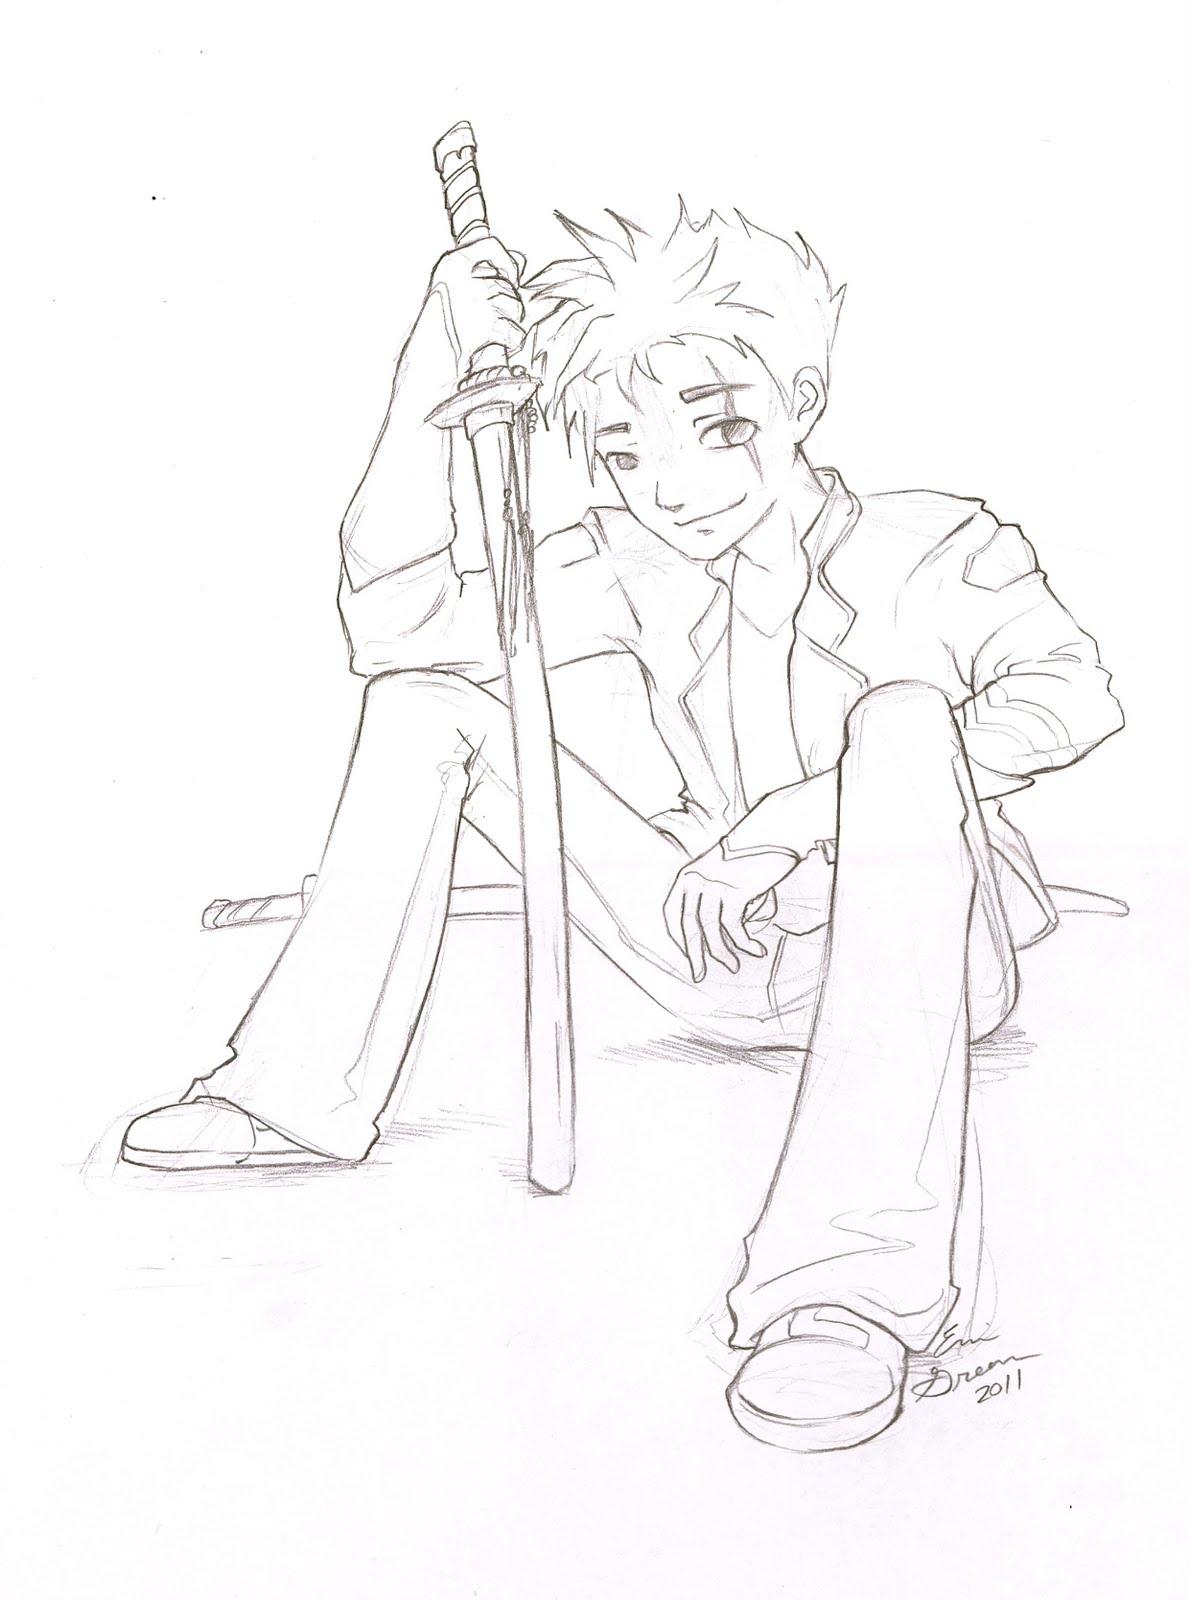 anime boy outline body: Rabbit Gear: November 2011